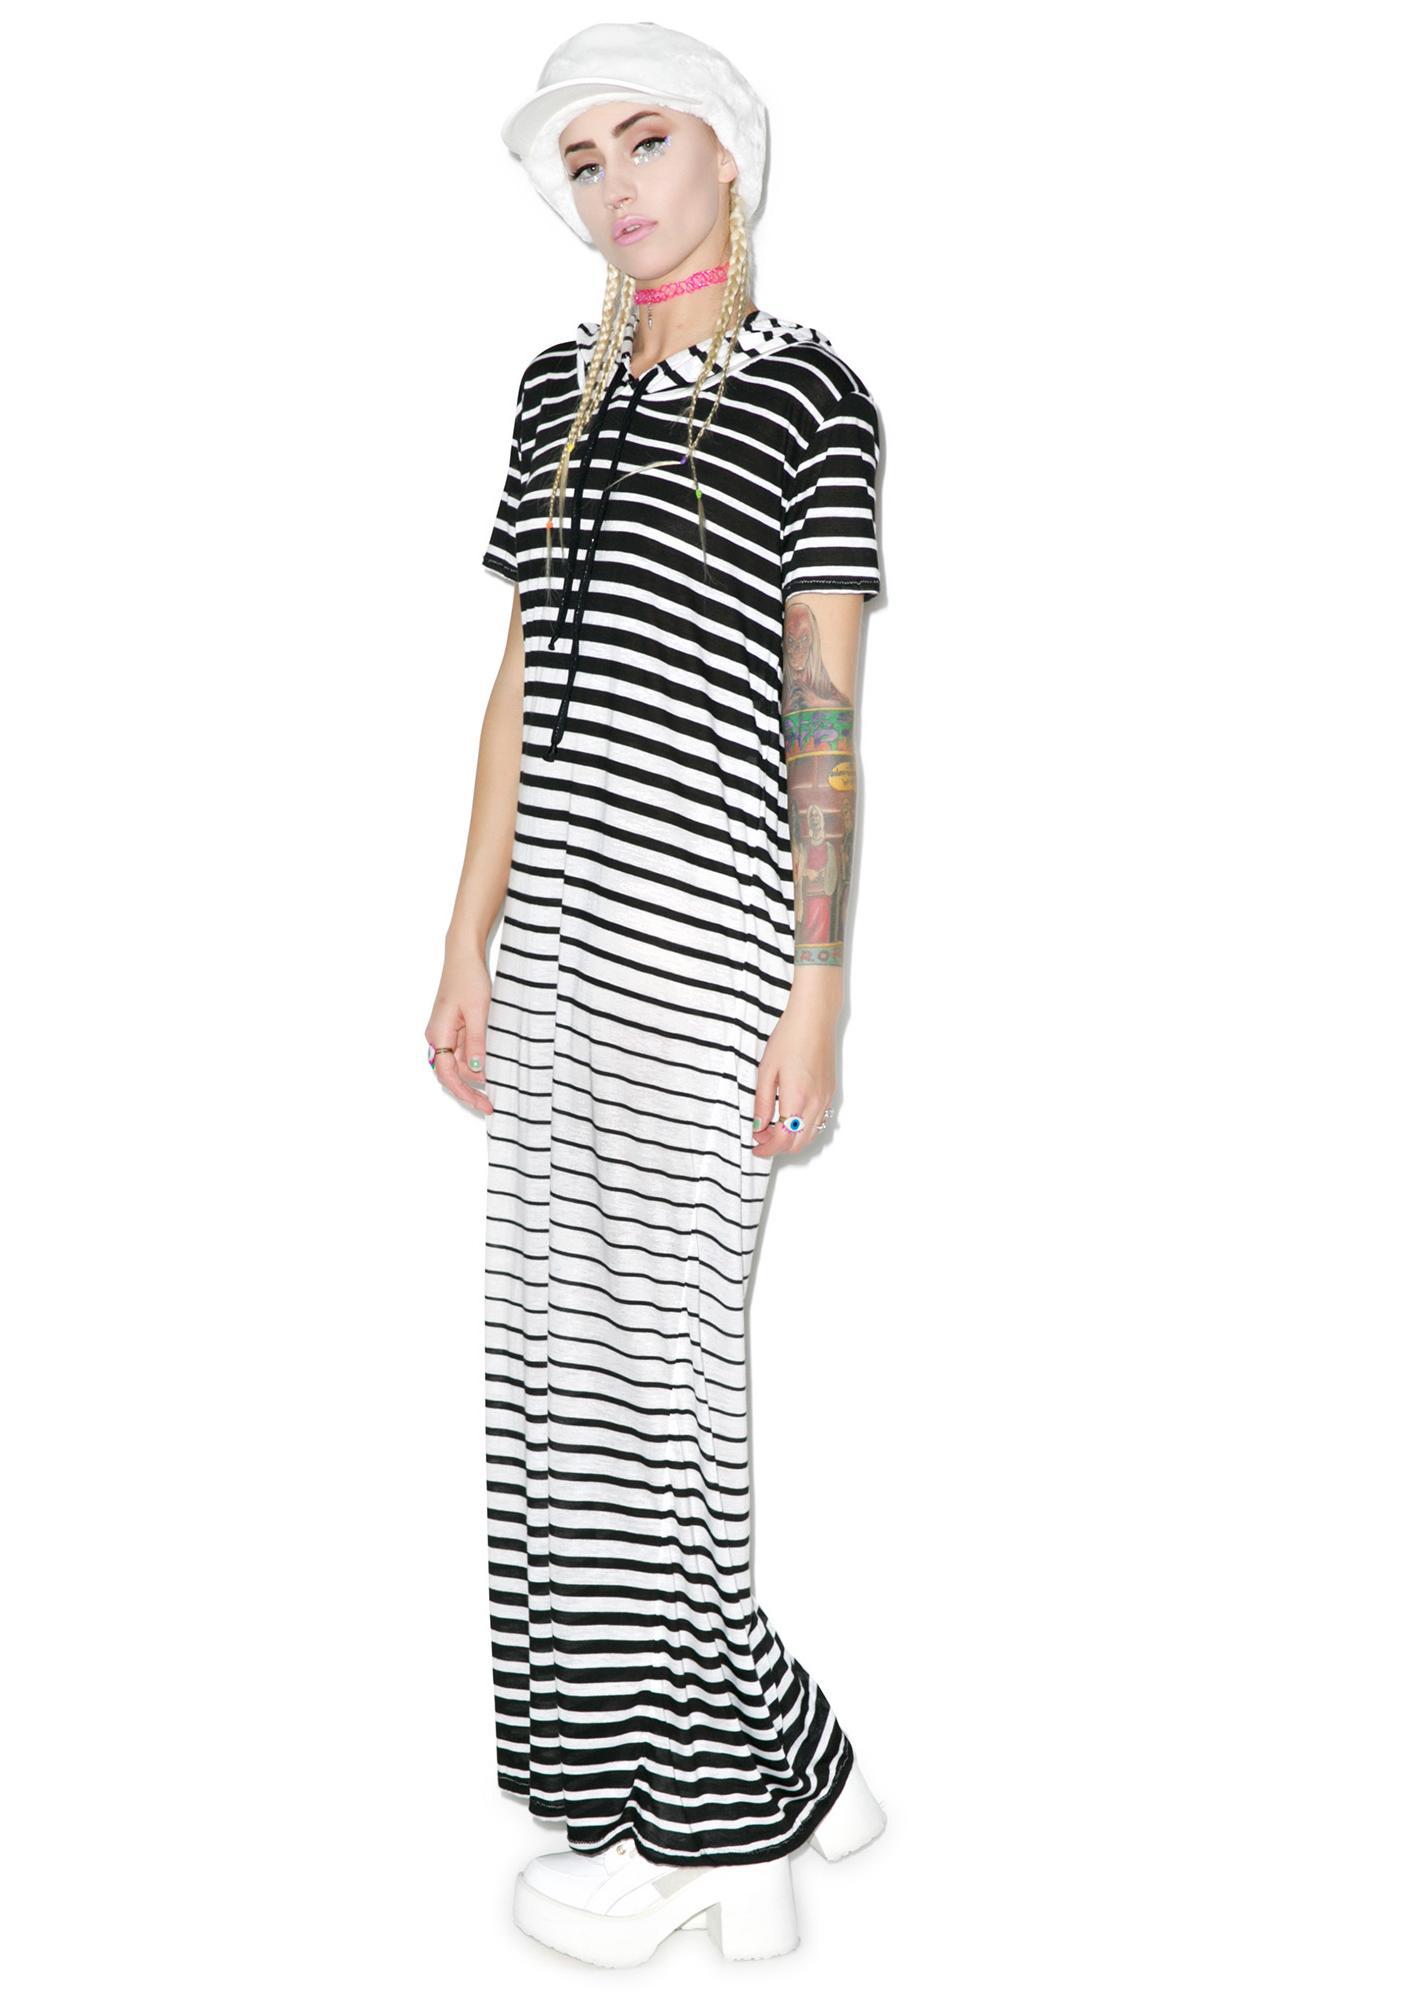 Mamadoux Preppy Goth Hoodie Dress